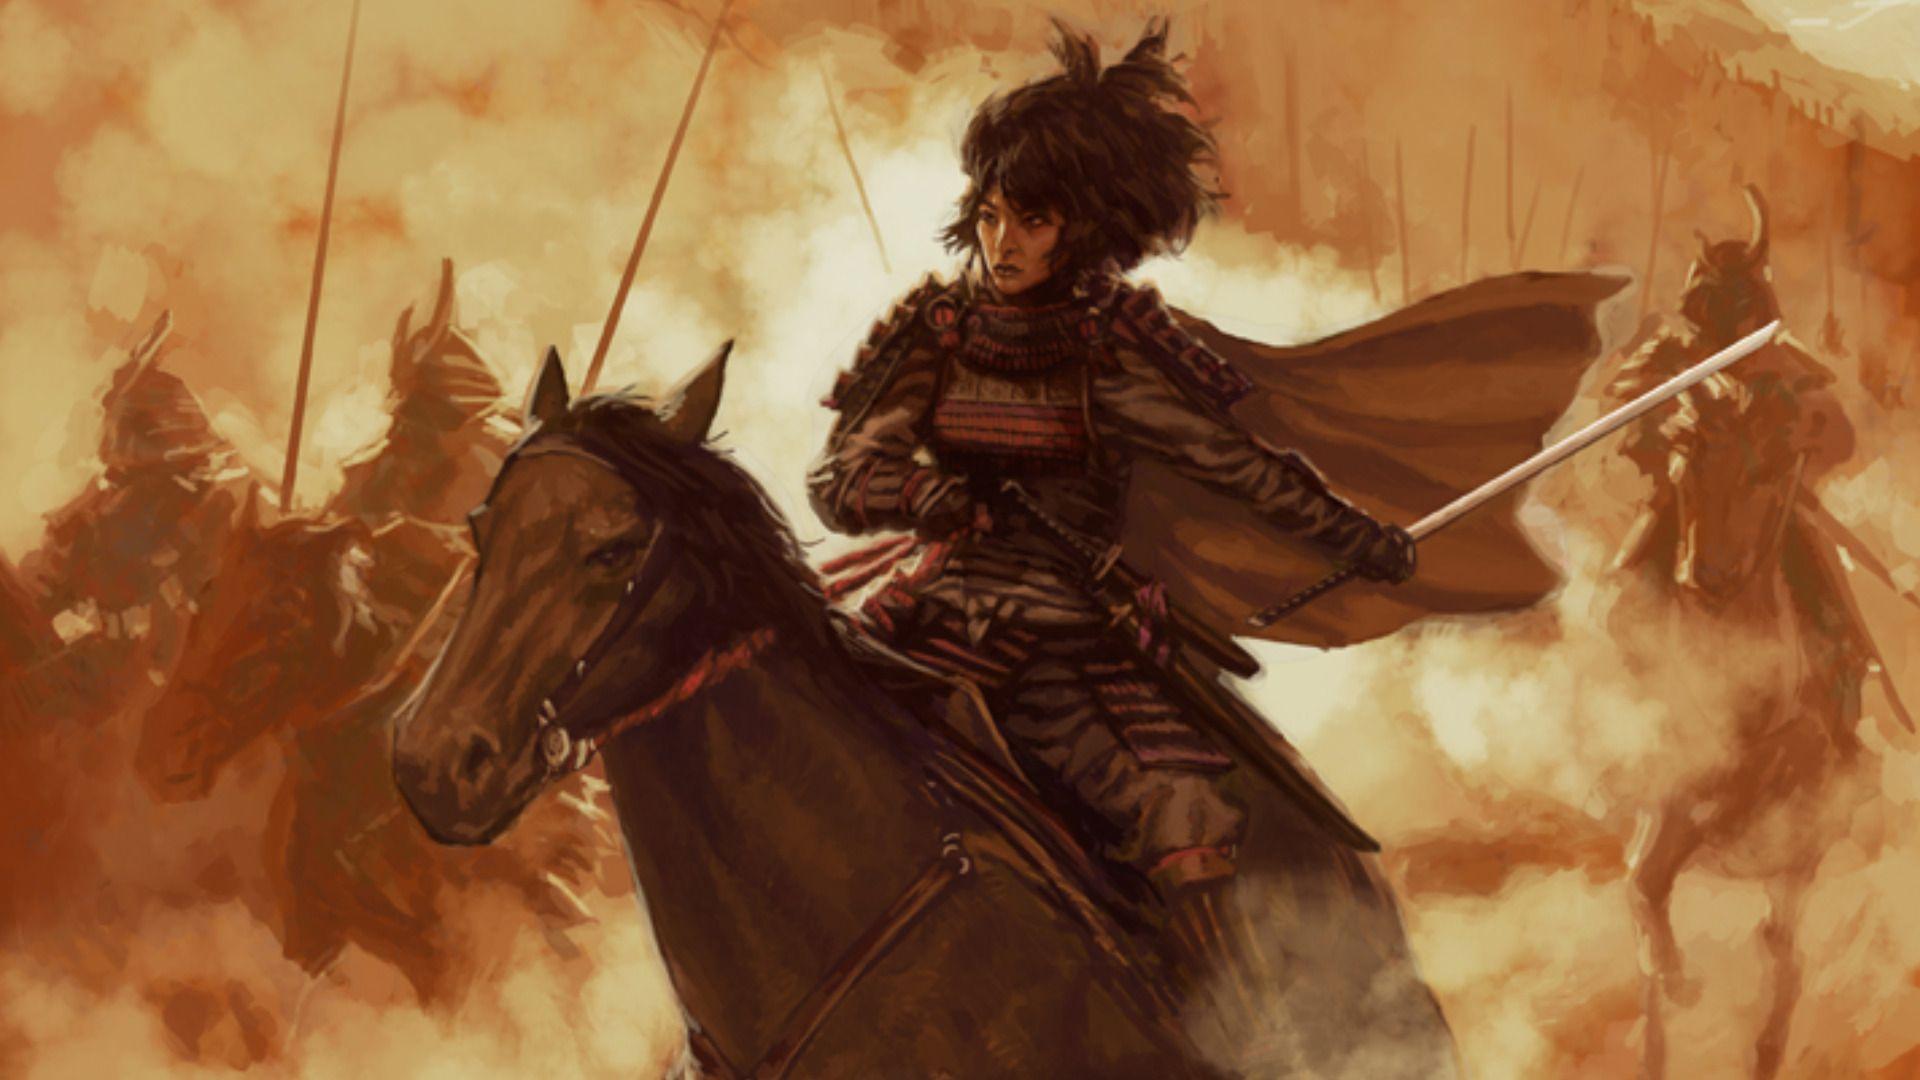 Simple Wallpaper Horse Warrior - 17a1b296833defead3be66e0114cb136  Trends_6178100.jpg